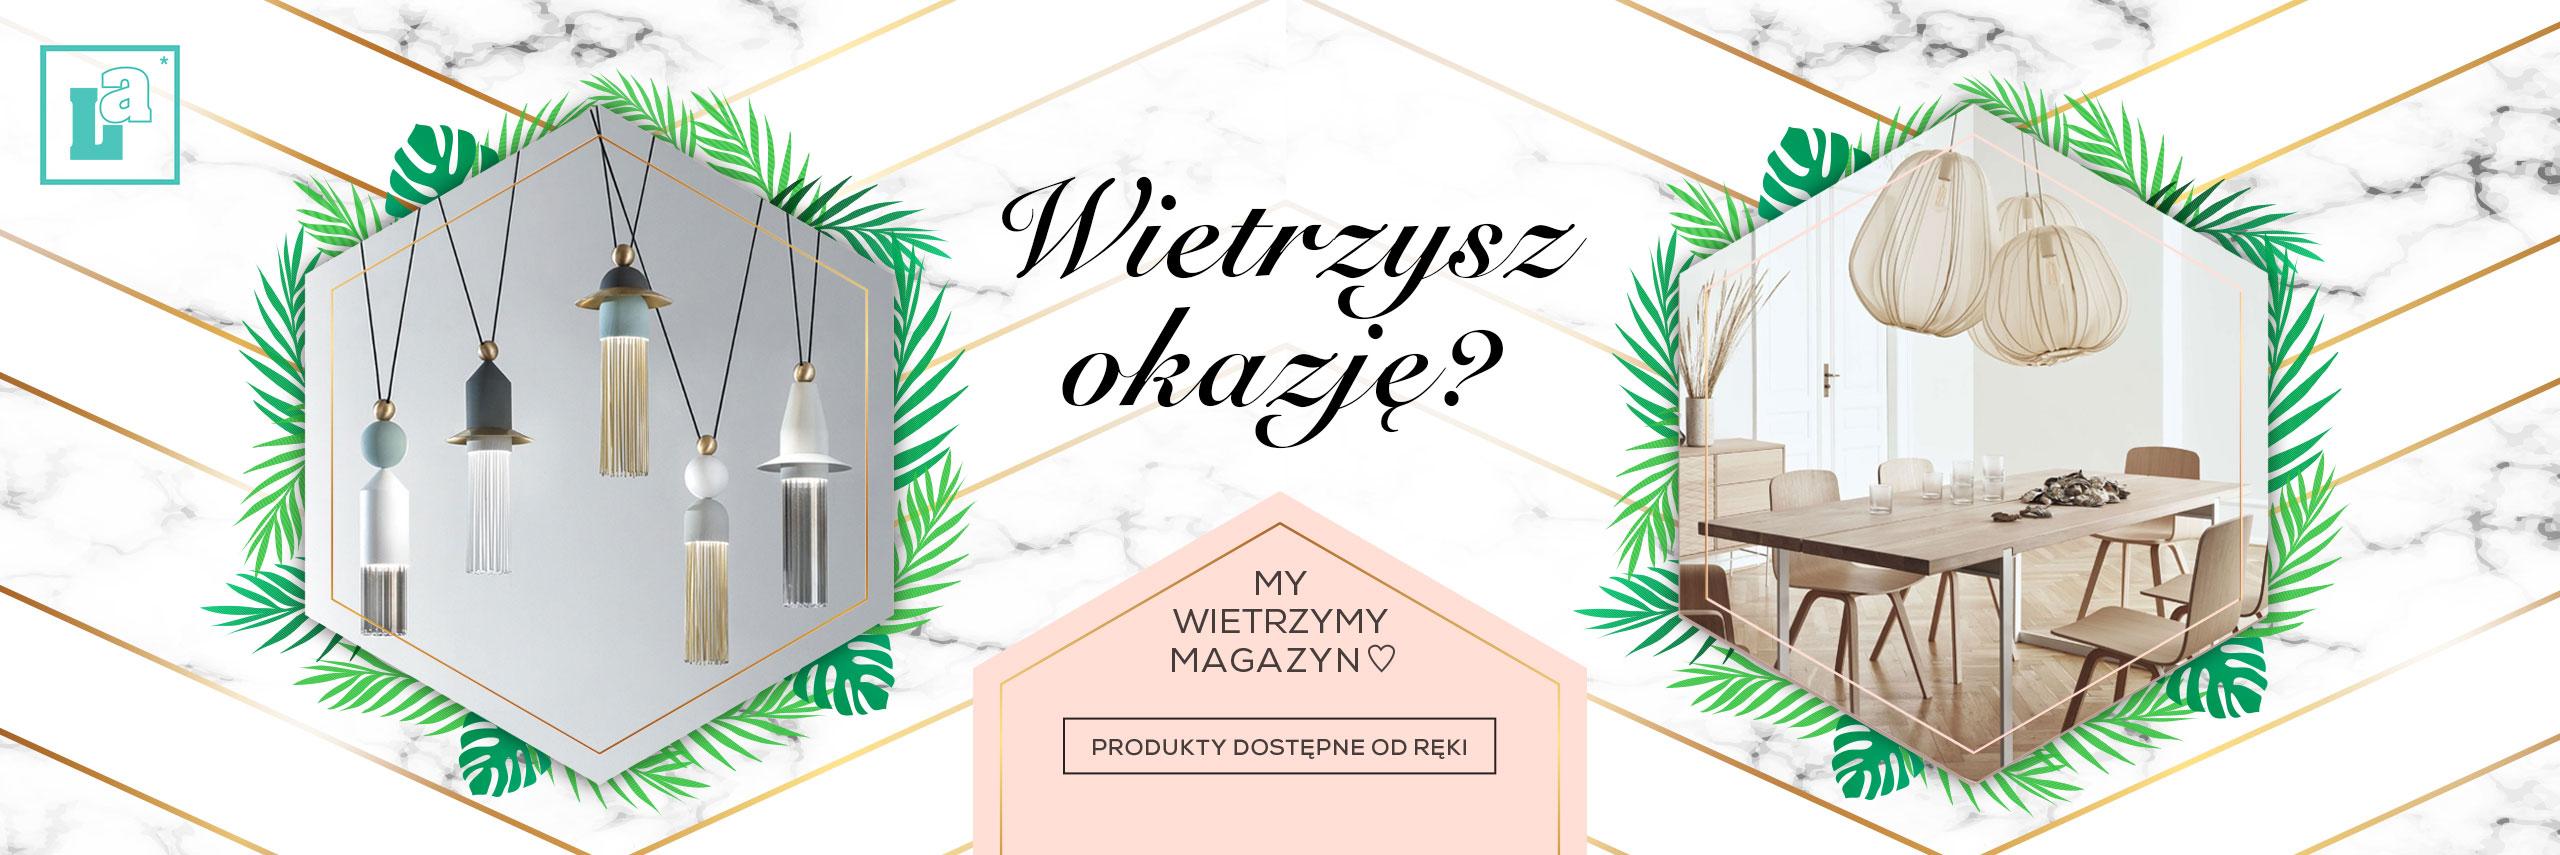 https://lafaktoria.pl/sites/default/files/revslider/image/LAFAKTORIA_baner_wiosna_2020_v2.jpg